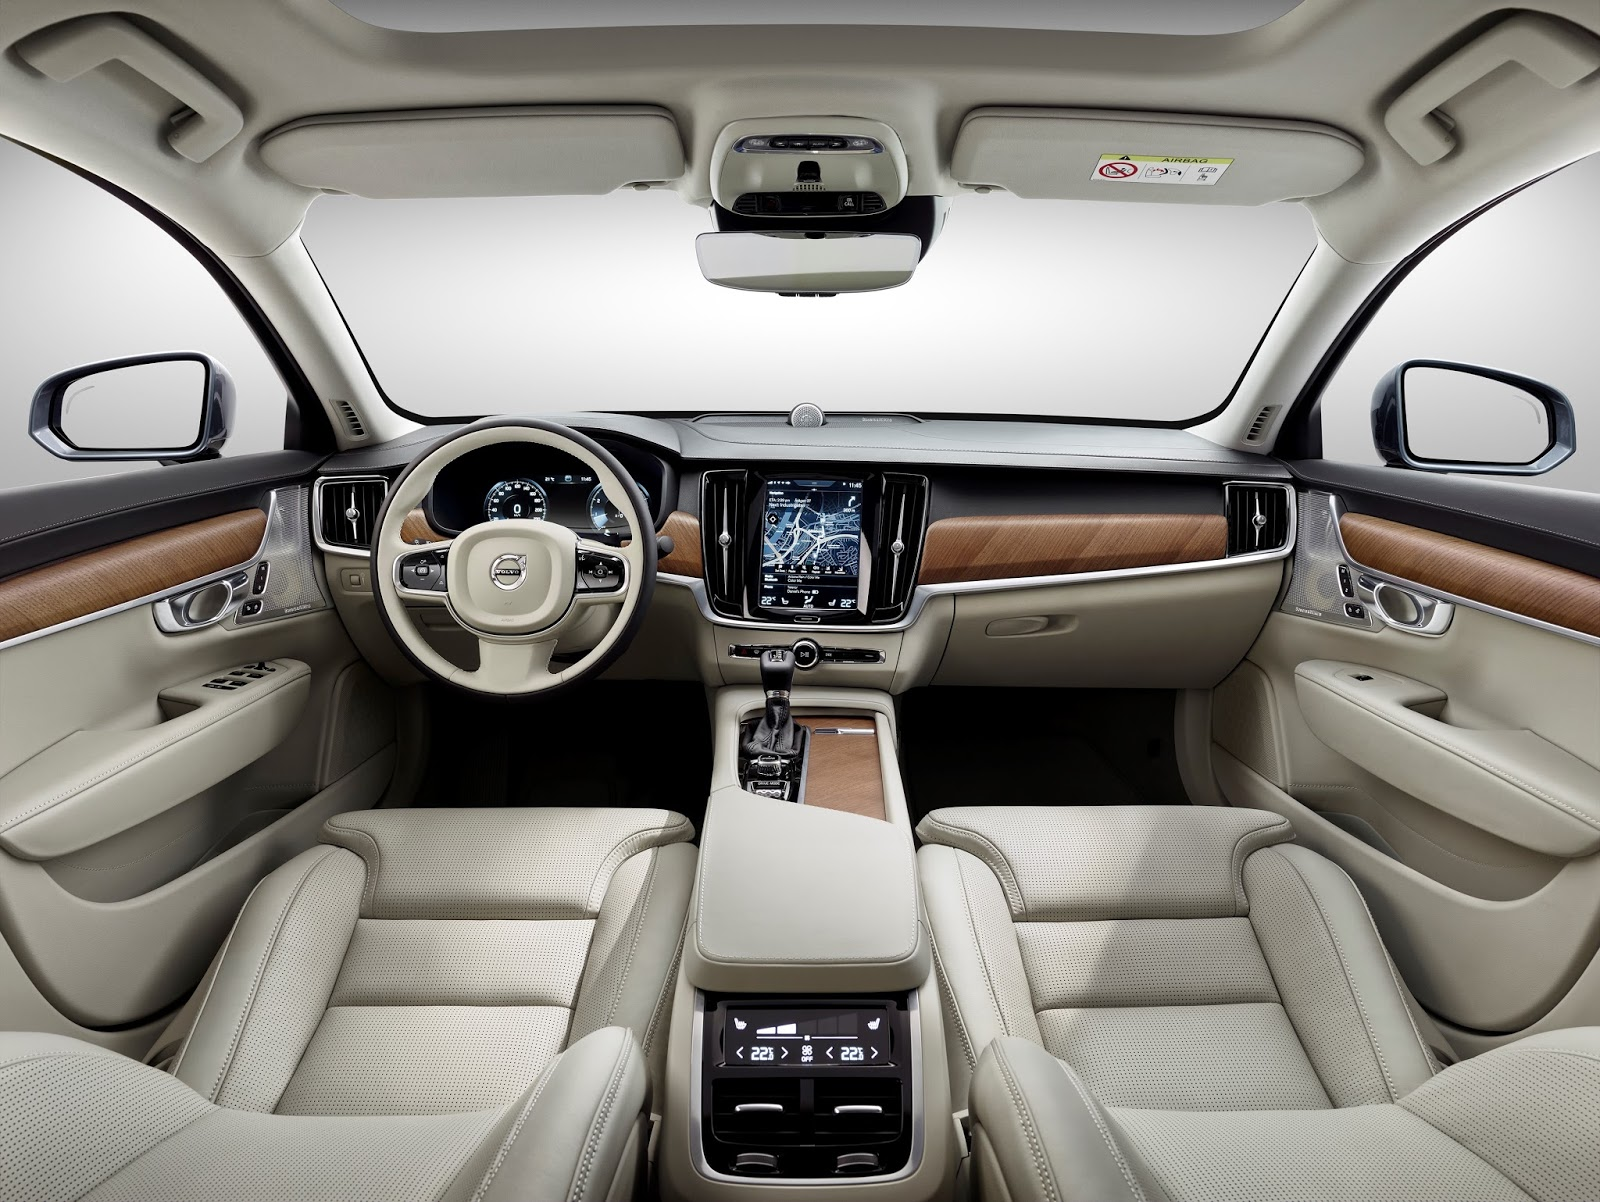 vol Γνώρισε το νέο, καταπληκτικό, αφεντικό της Lotus Lotus, Volvo, zblog, αυτοκίνητα, καινούρια, μεταχειρισμένα